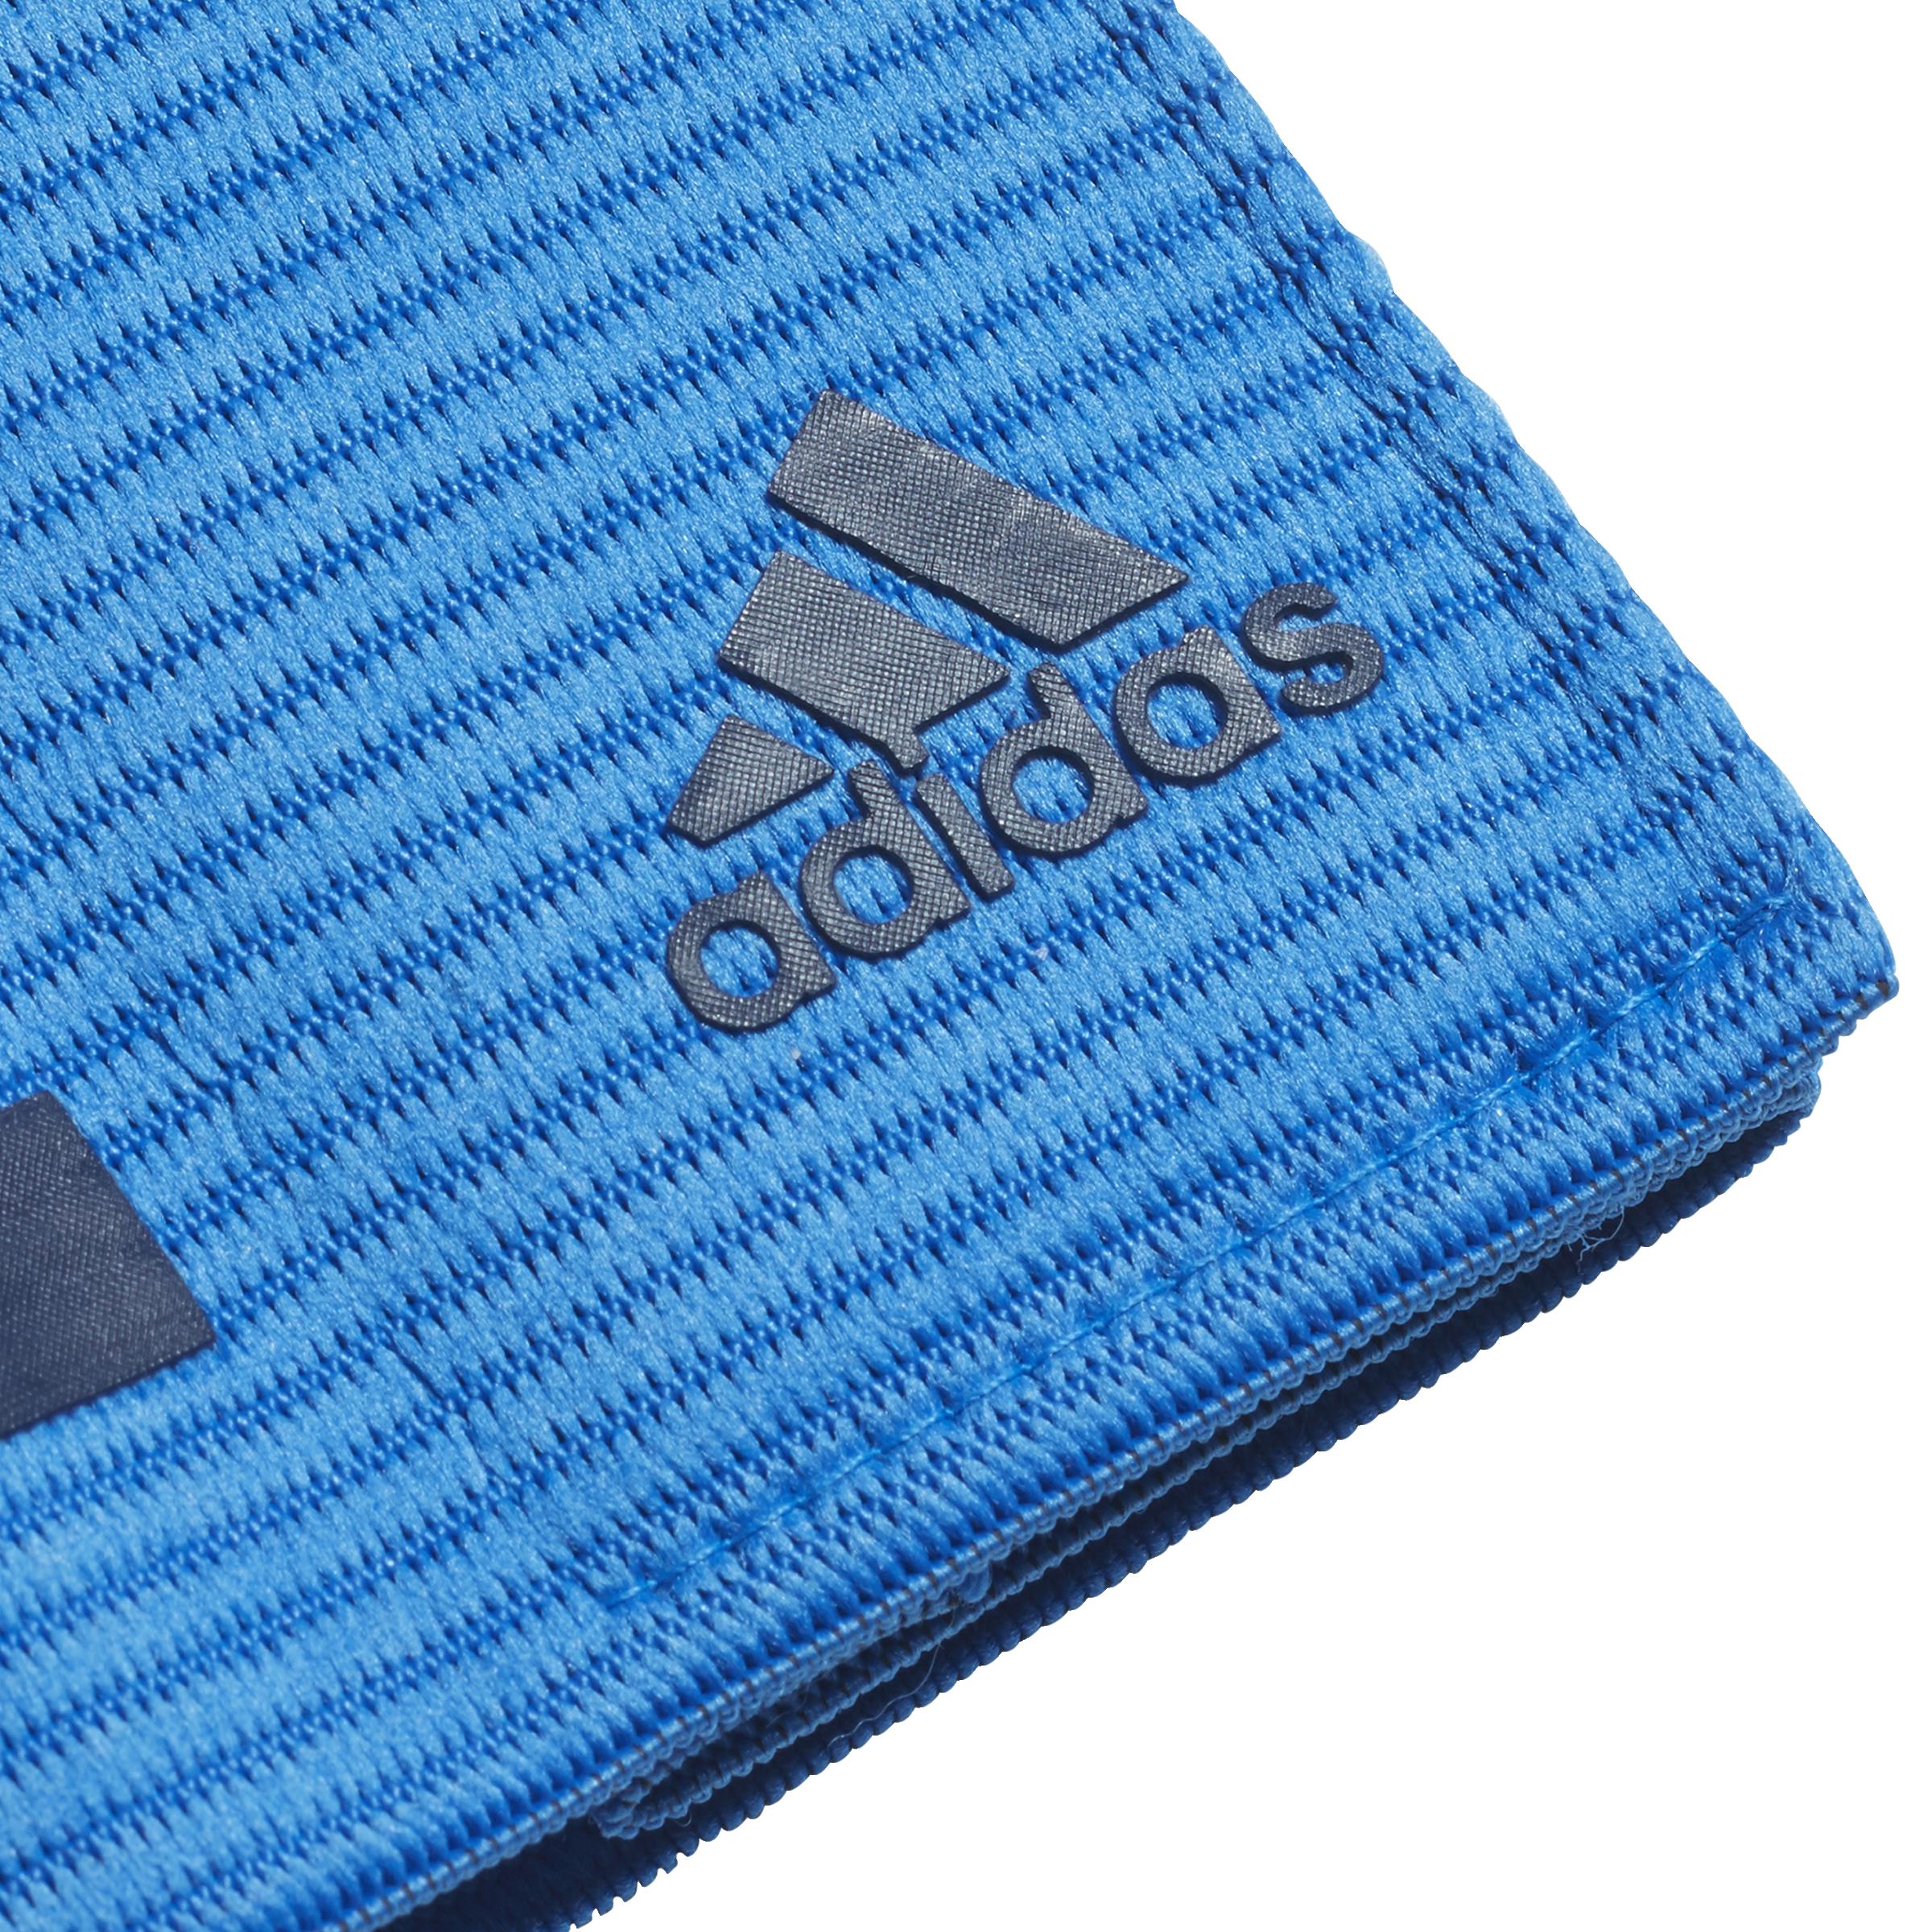 quality design 5b254 939b0 Fascia da capitano di calcio   adidas LOCKER ROOM